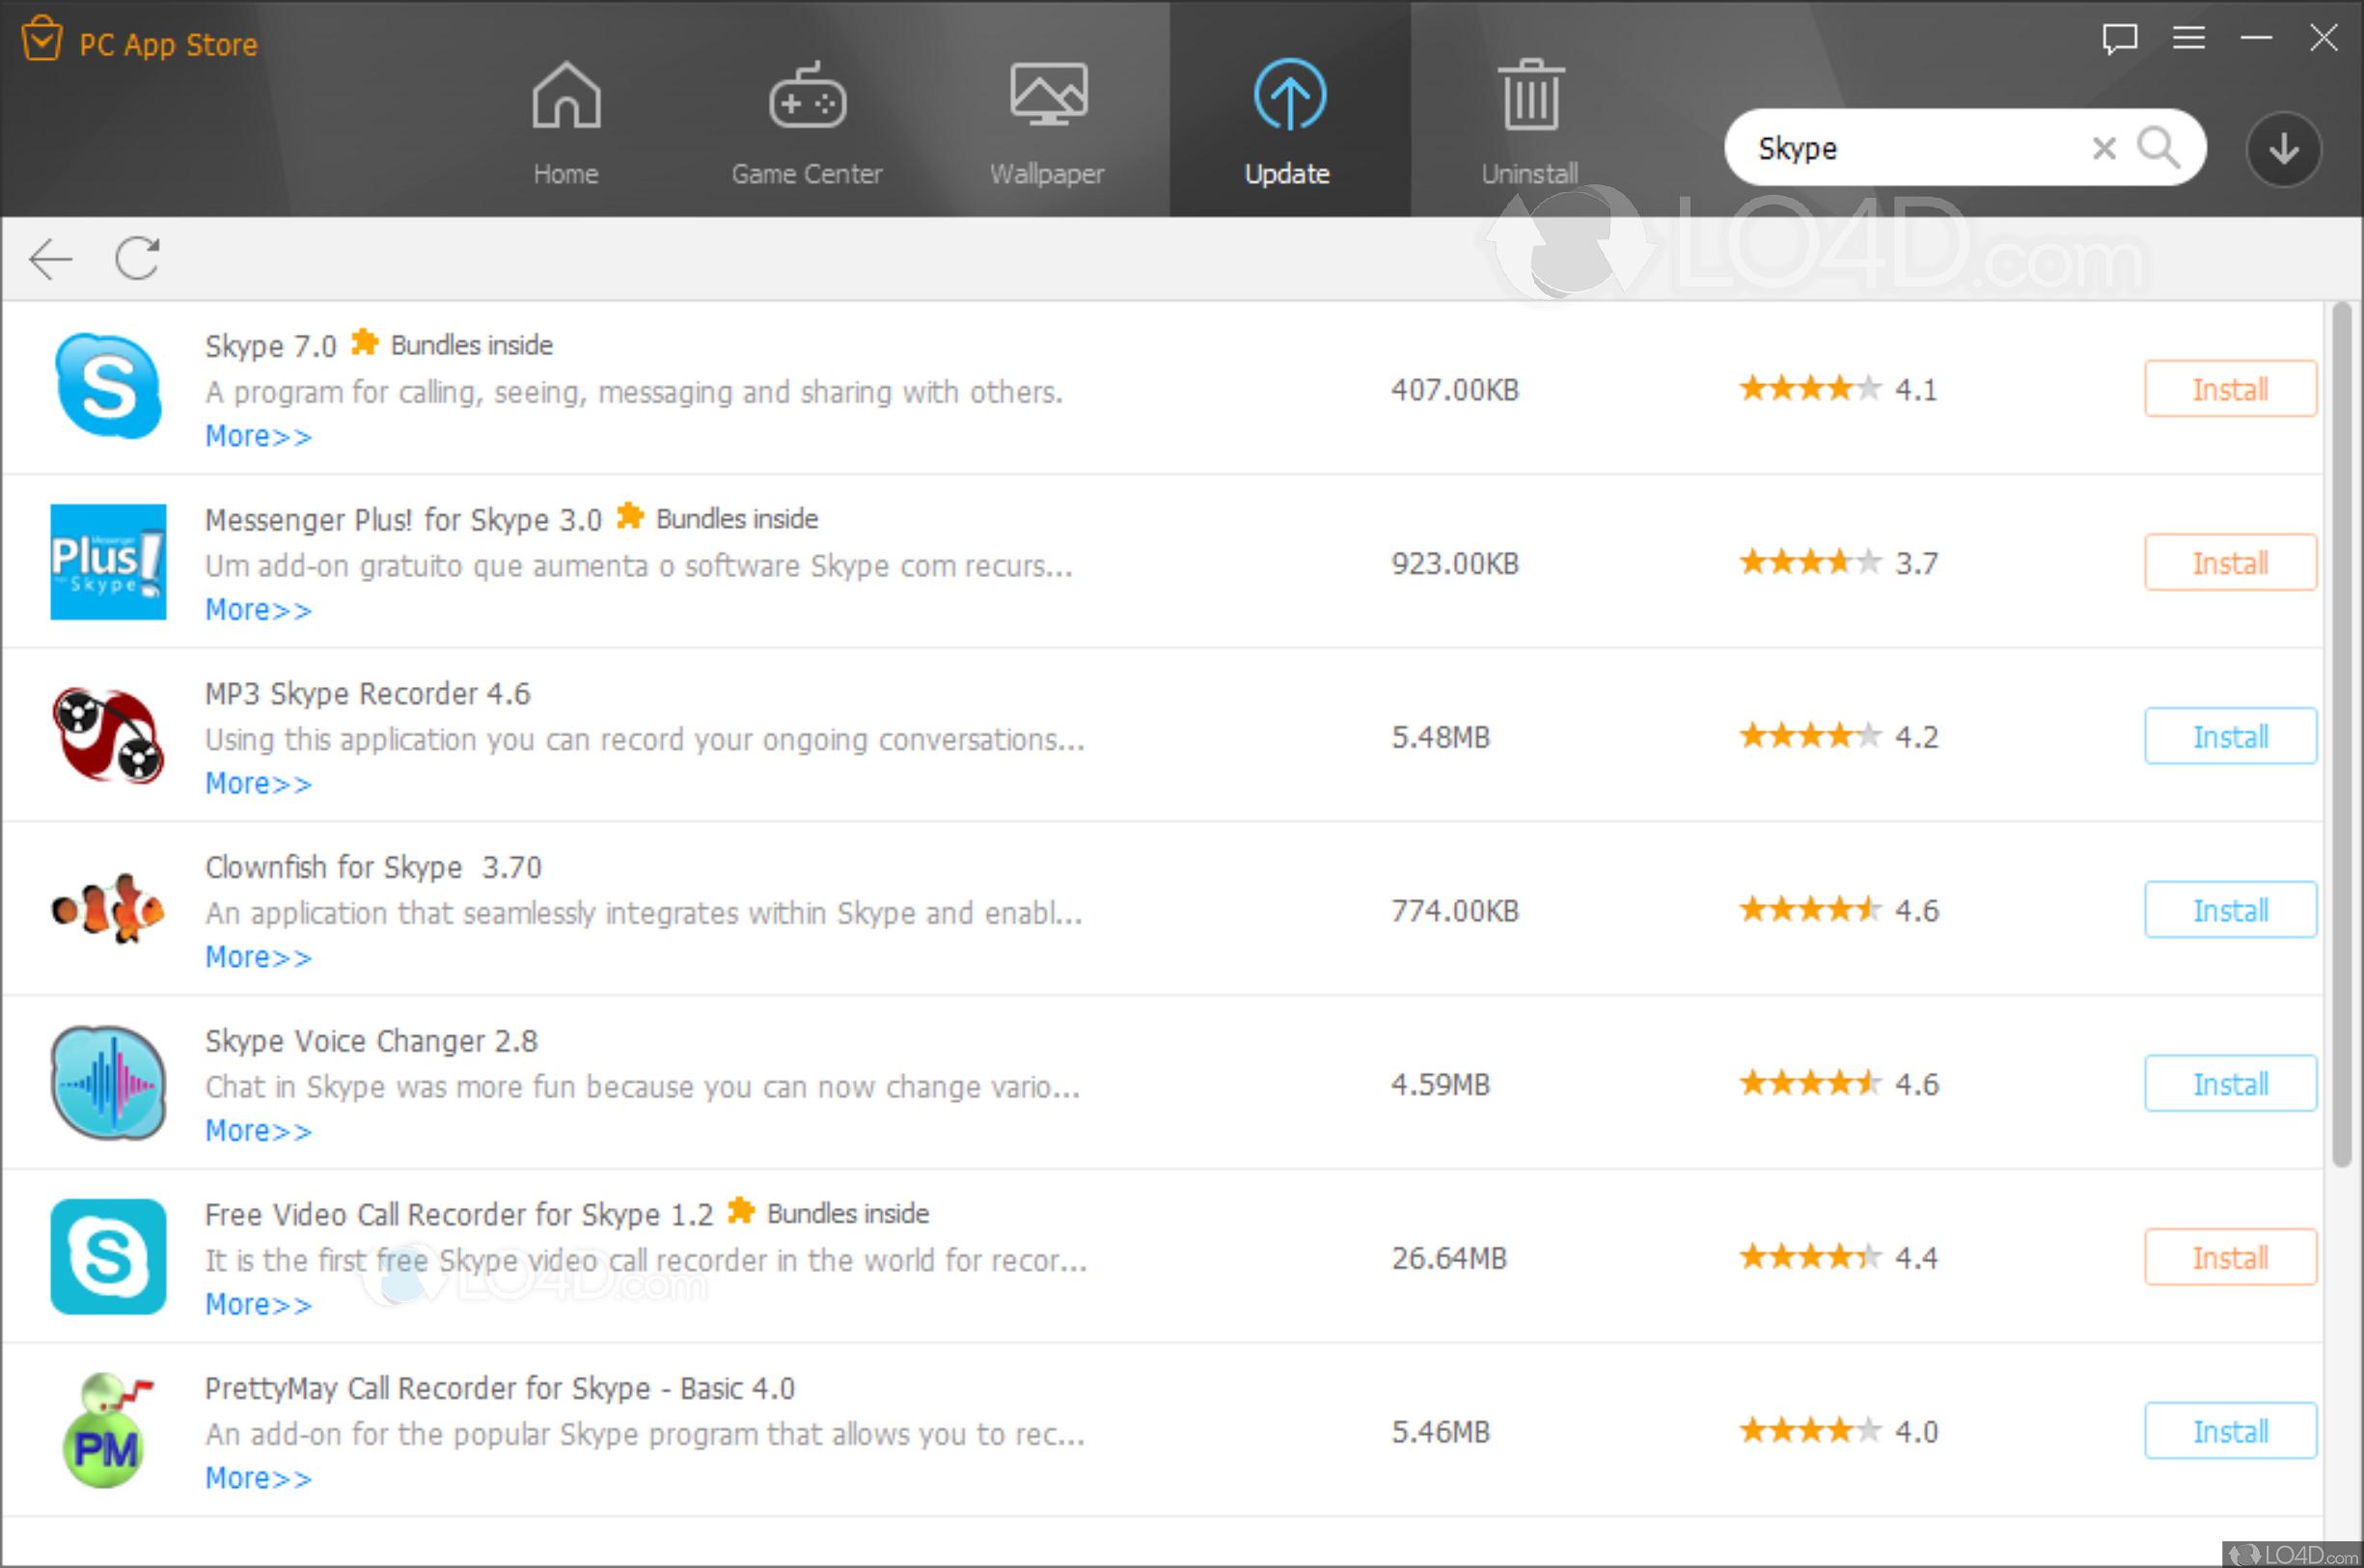 descargar play store gratis para laptop windows 7